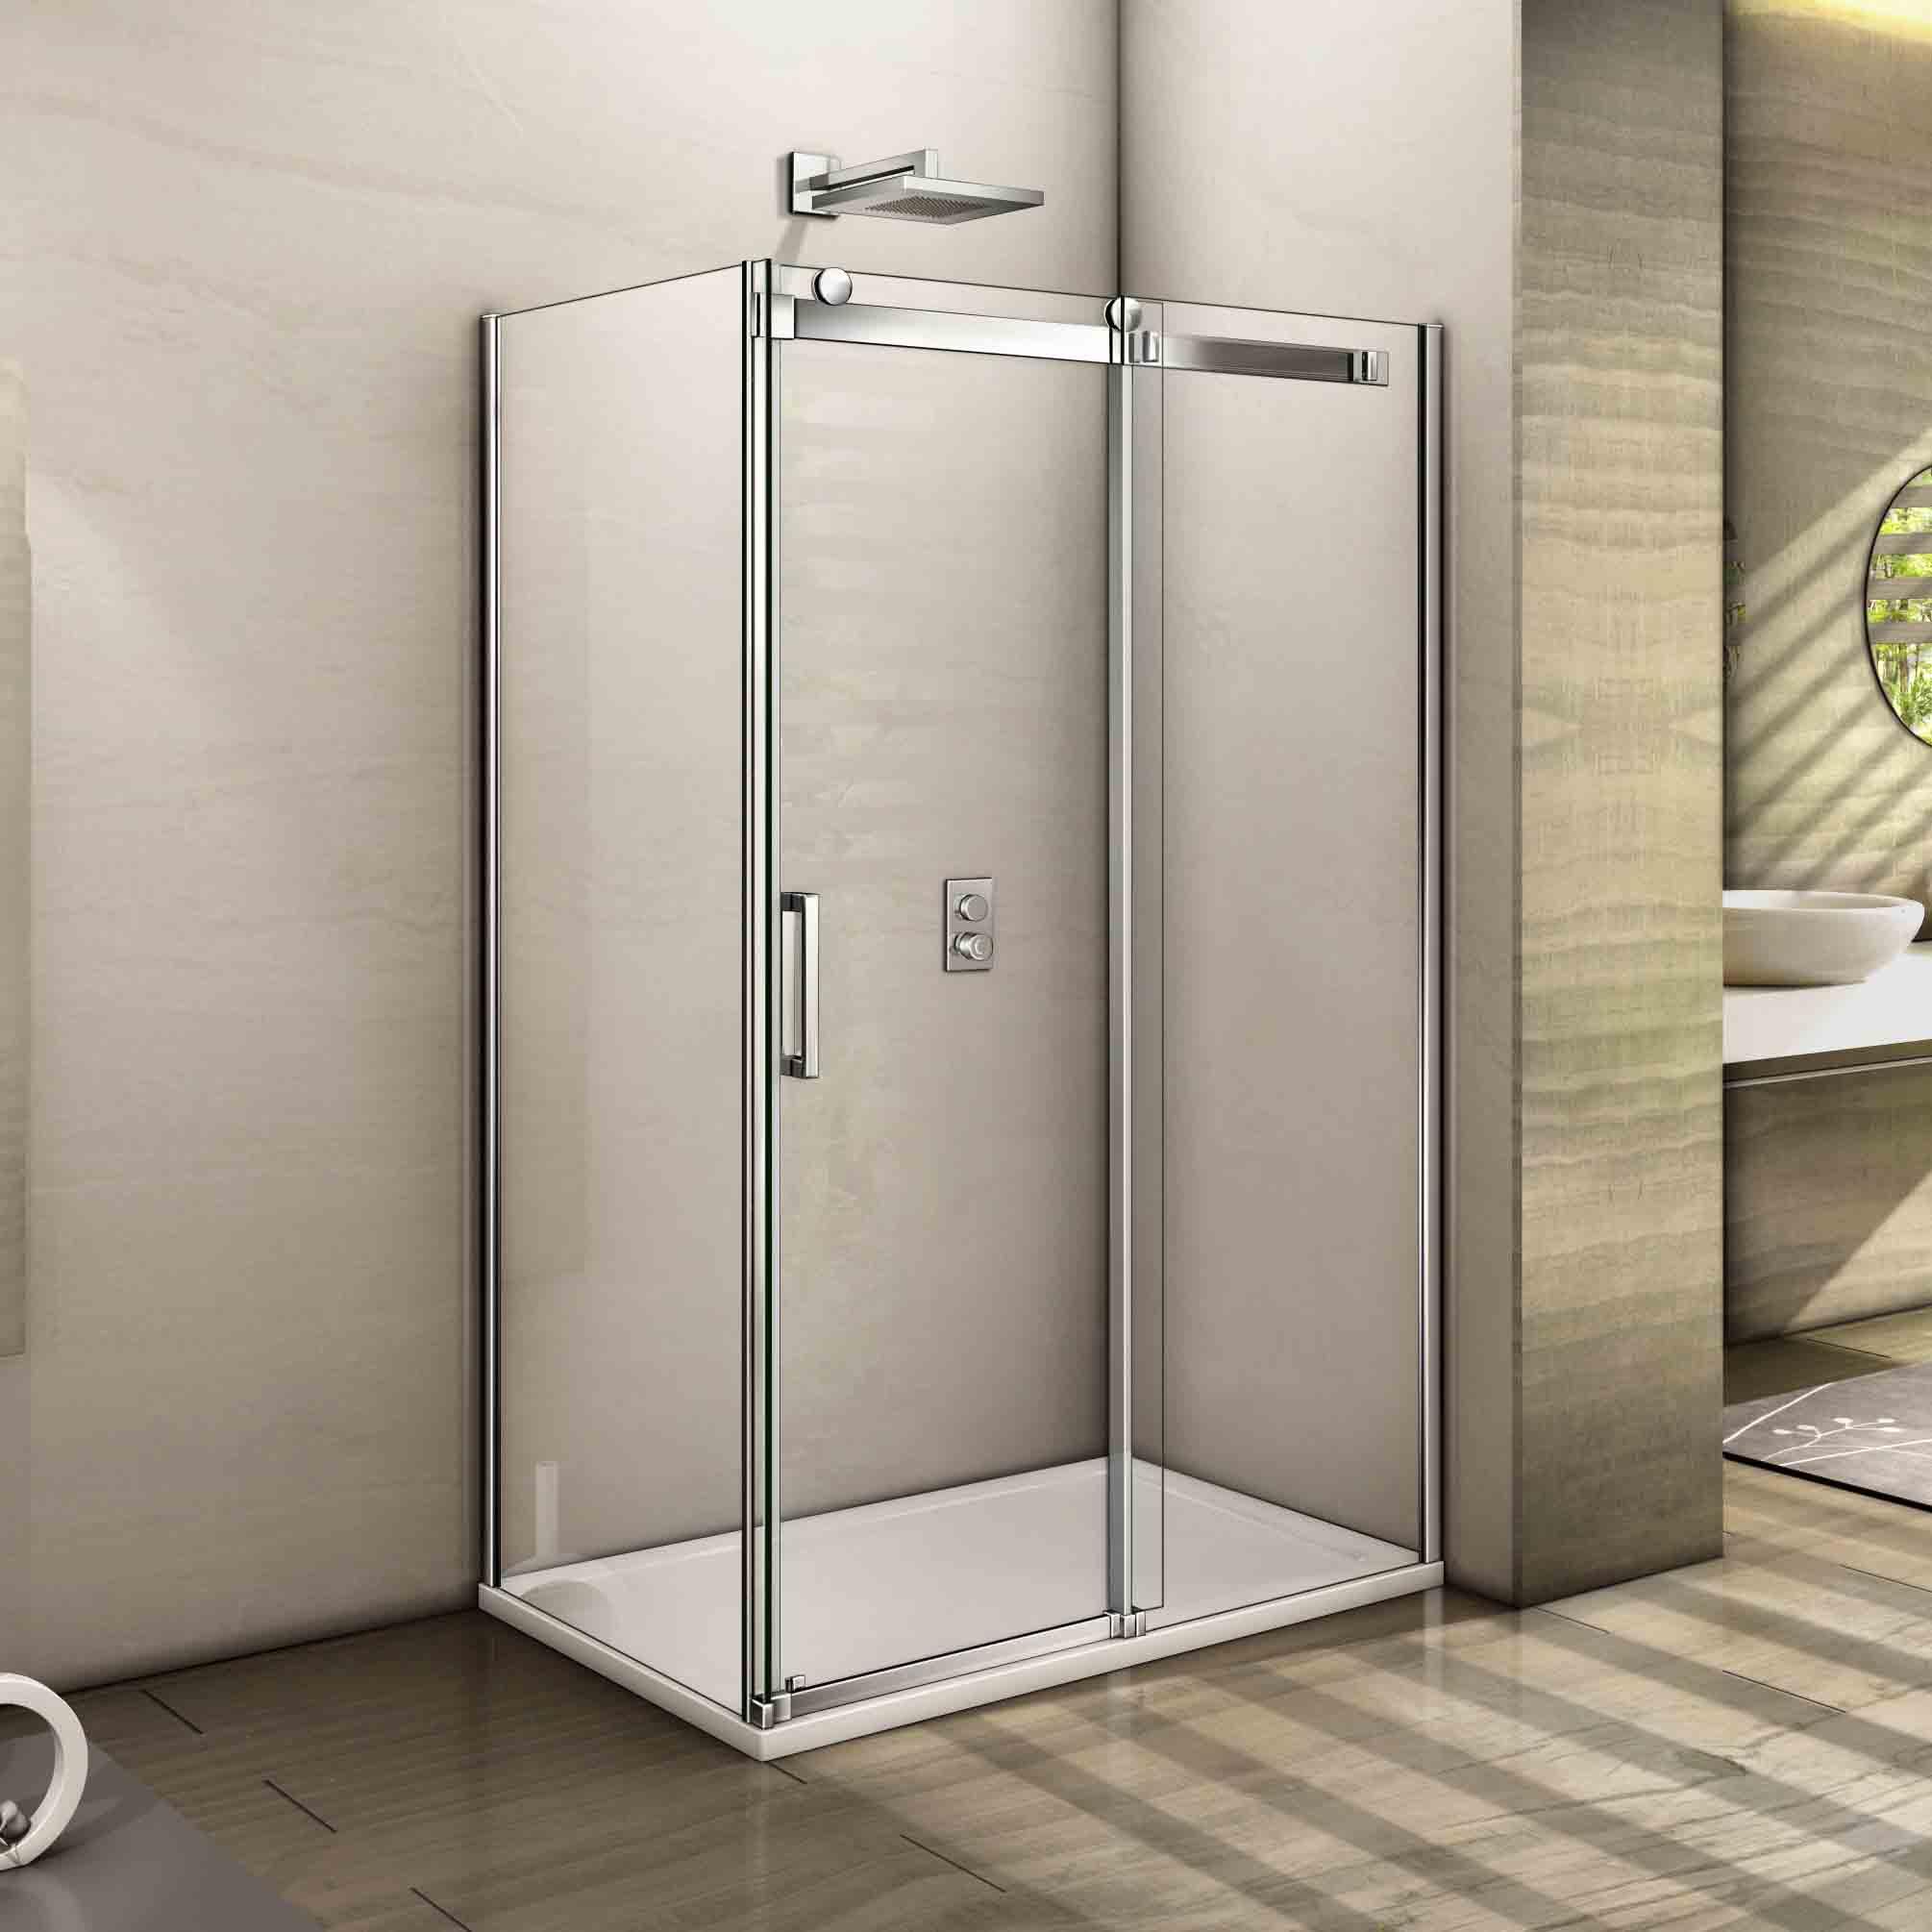 2010 #919E2D  Enclosure Sliding Door Easyclean Glass Screen Tray 1200x2000mm EBay image Ebay Entry Doors 41532010